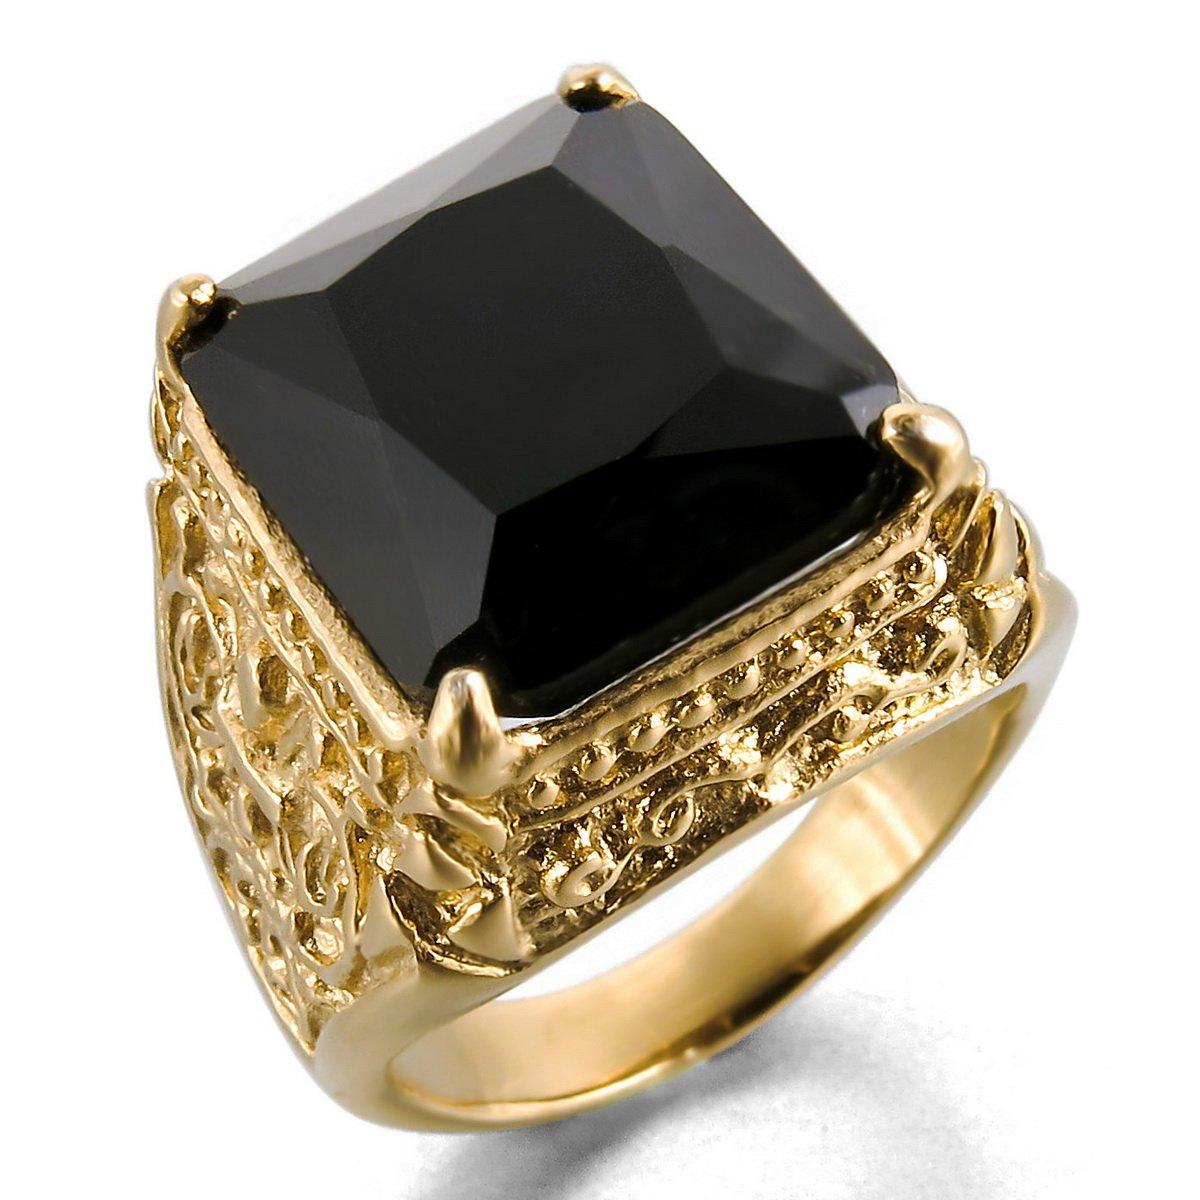 MunkiMix Acero Inoxidable Vidrio Glass Anillo Ring Oro Dorado Tono Negro La Flor De Lis Dragón Garra Grabado Hombre ve432-parent